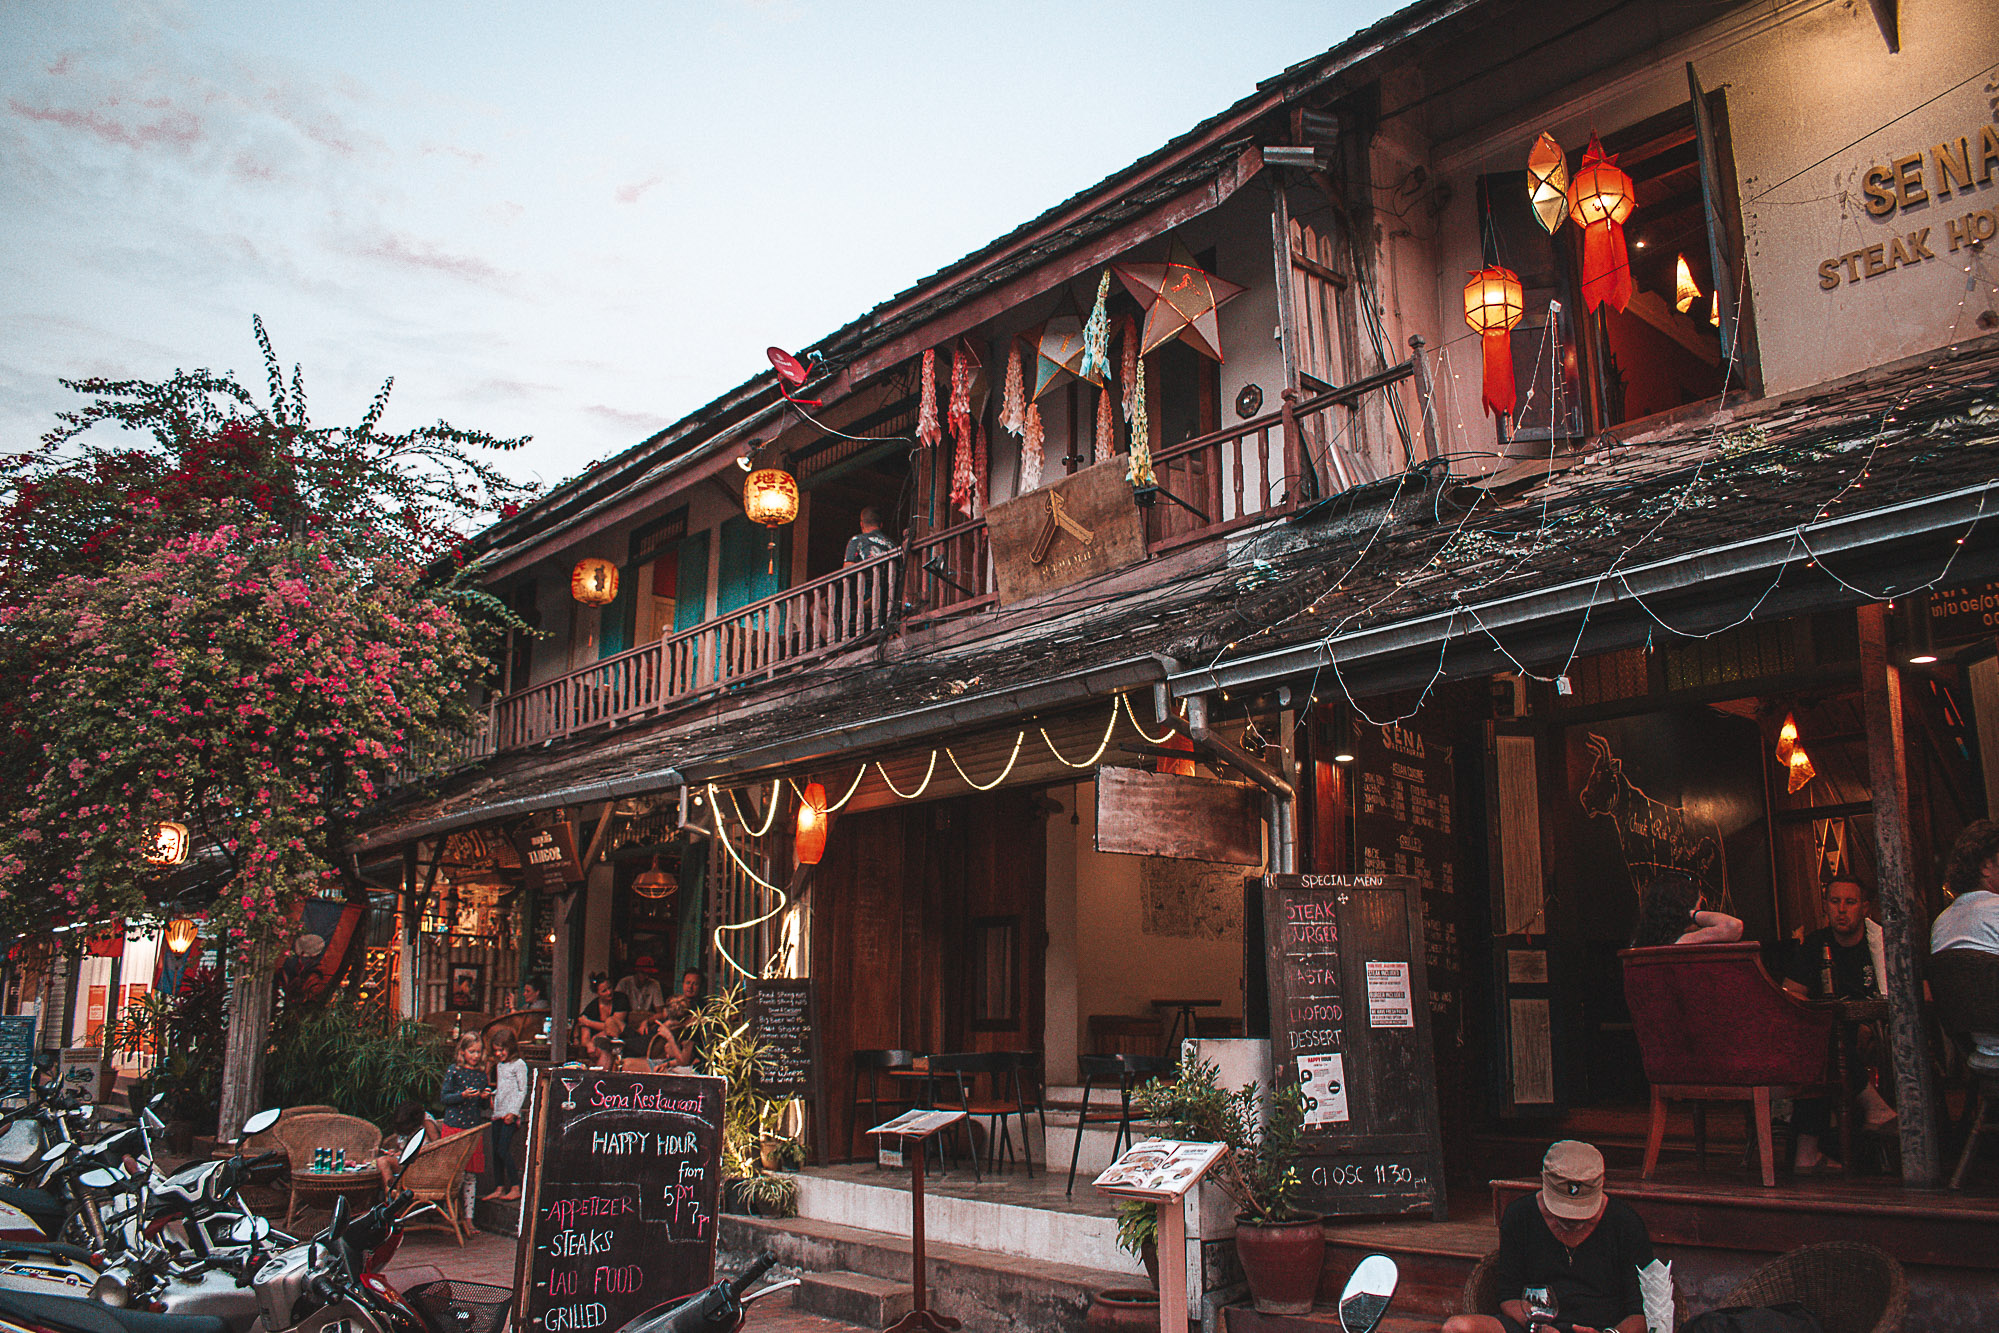 Visto do Laos passo a passo completo